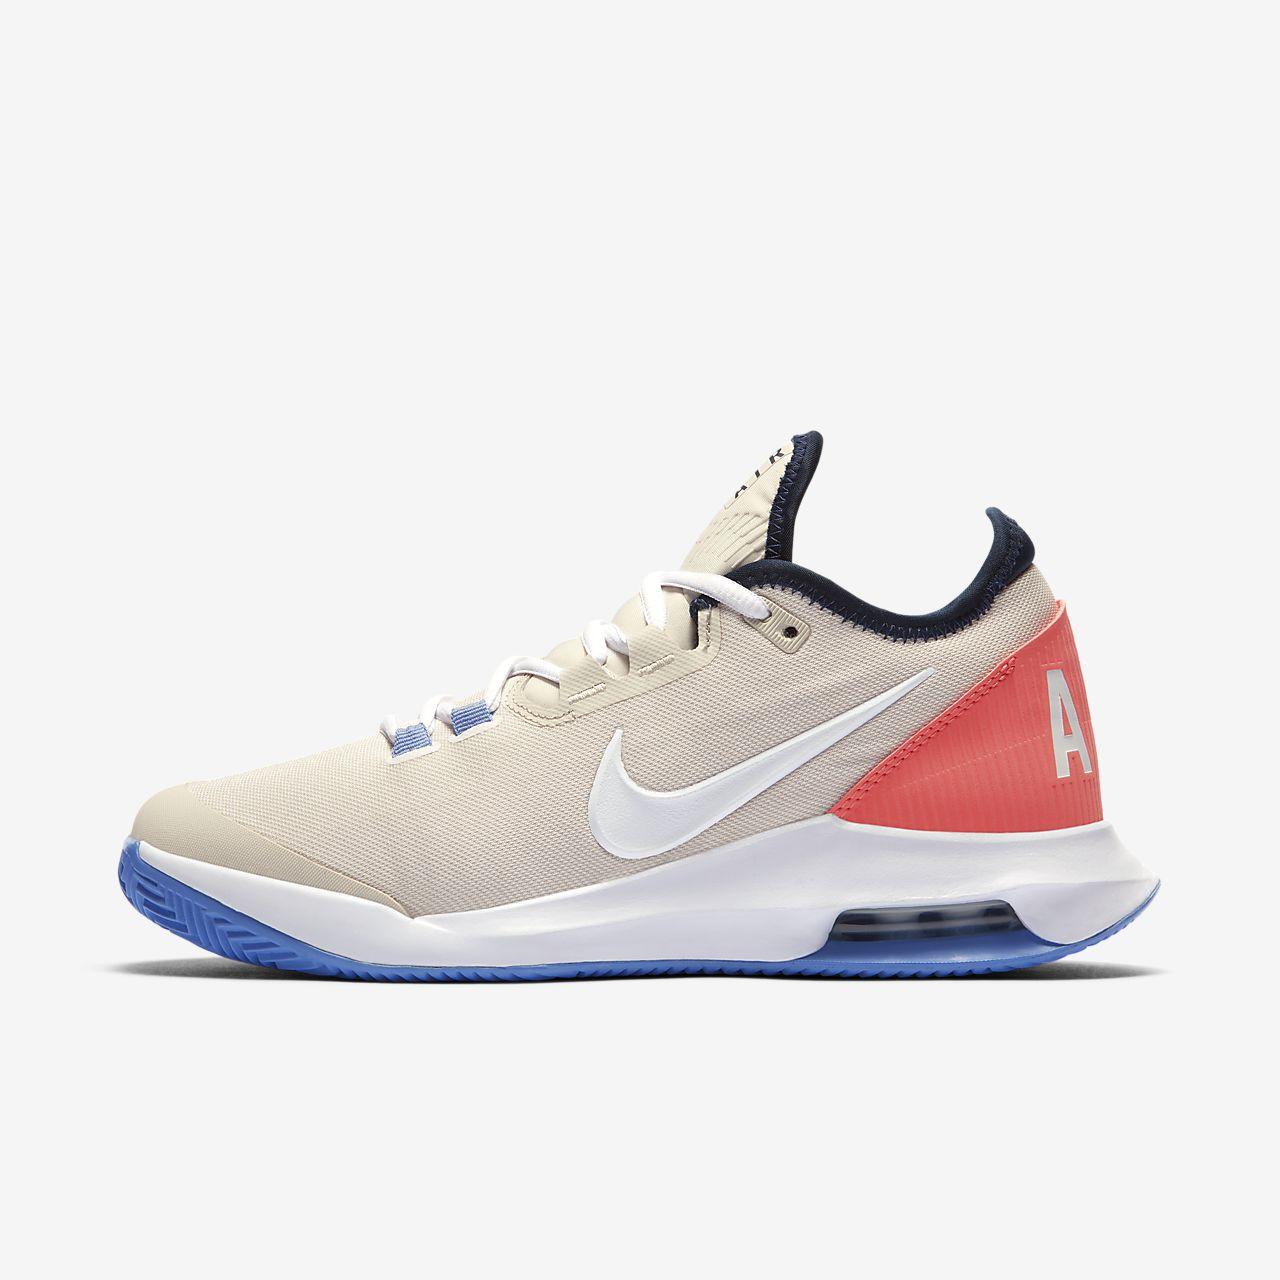 NikeCourt Air Max Wildcard Women's Clay Tennis Shoe